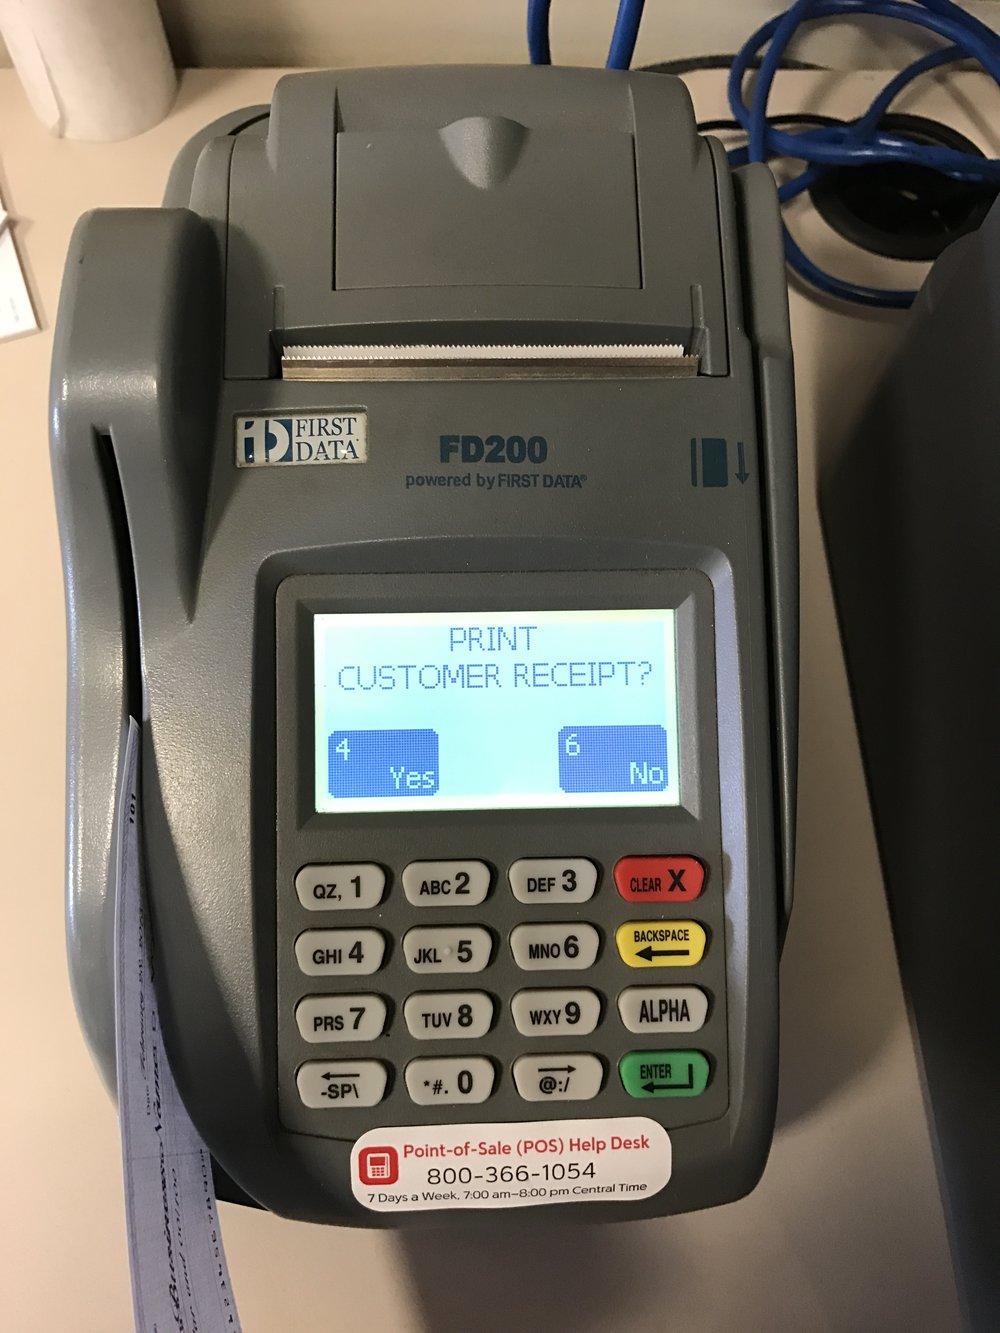 10. Print Customer Receipt? ALWAYS press Yes